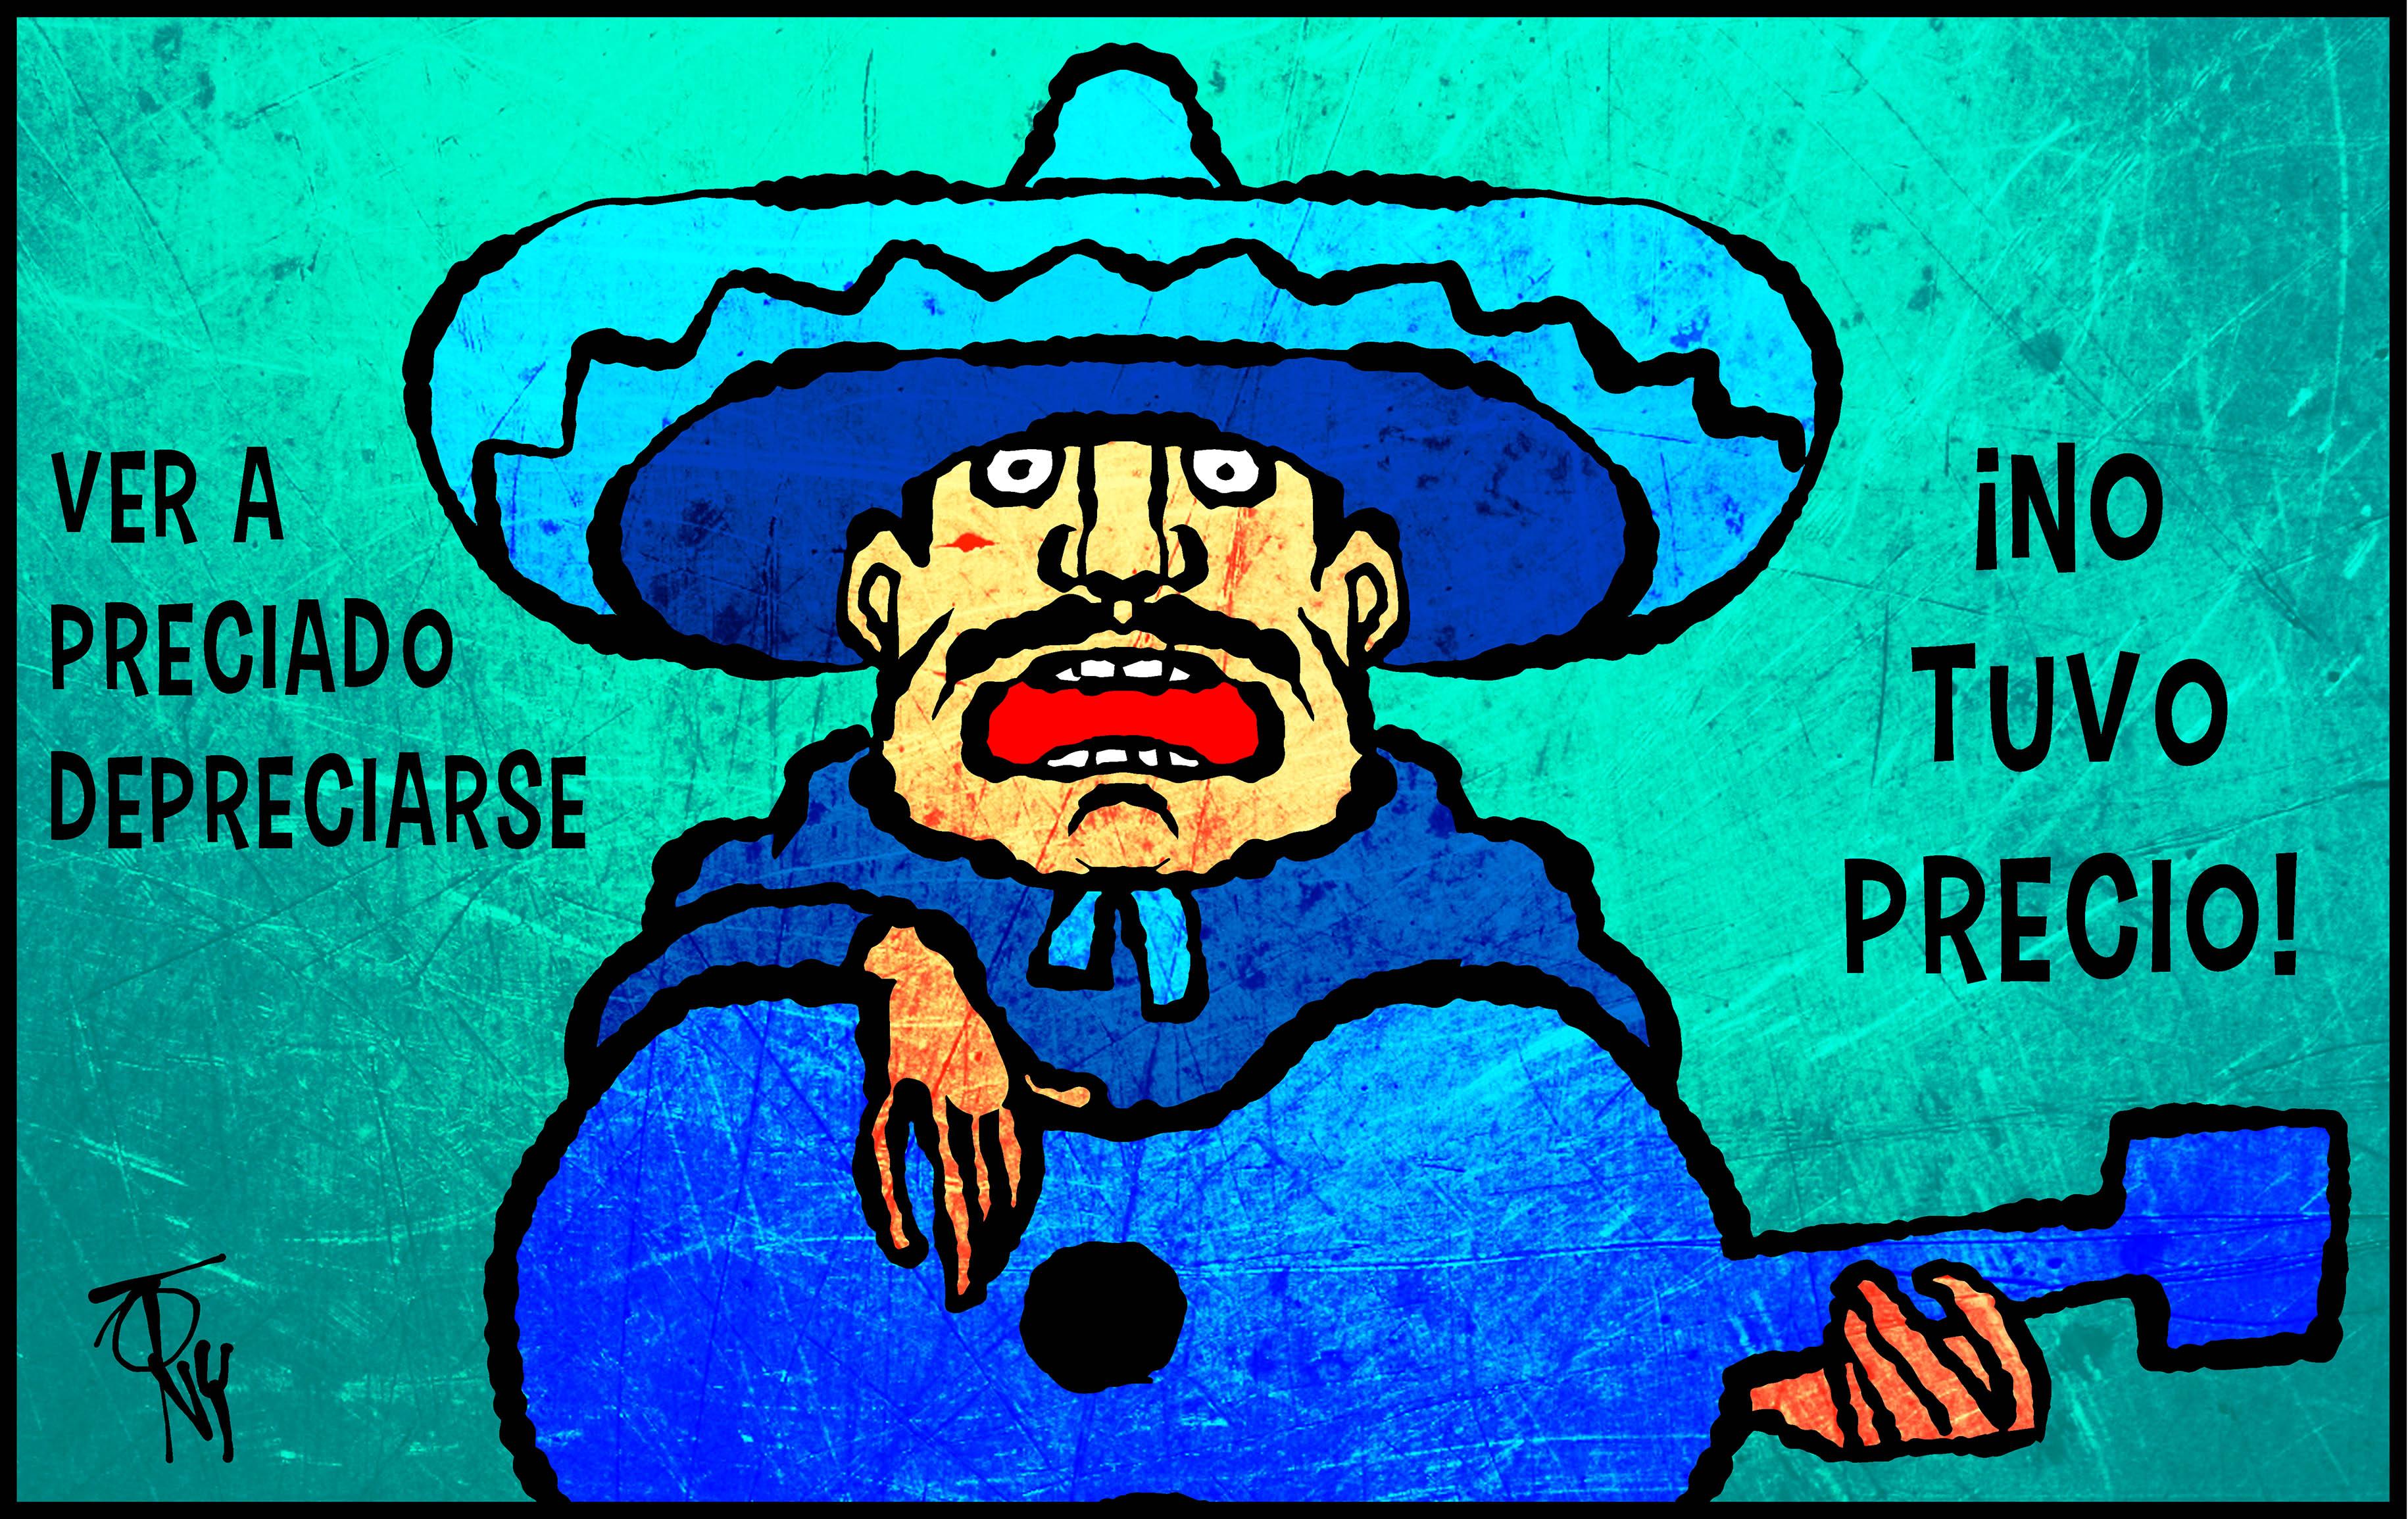 los mariachis callaron